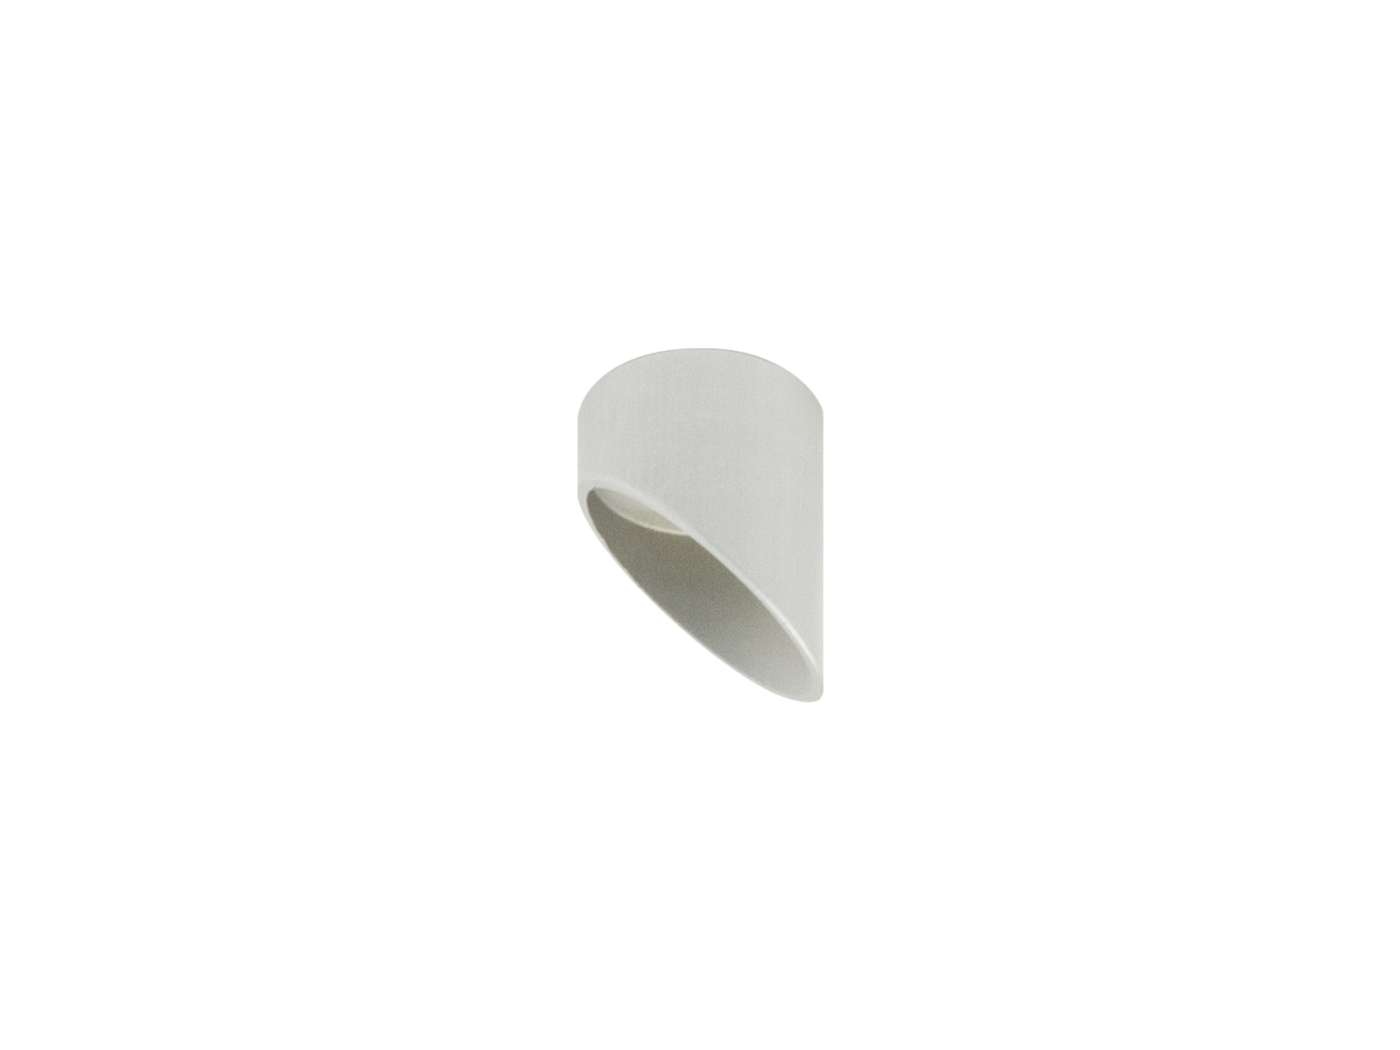 Highline_Diagonal_3K_White_1600x1200